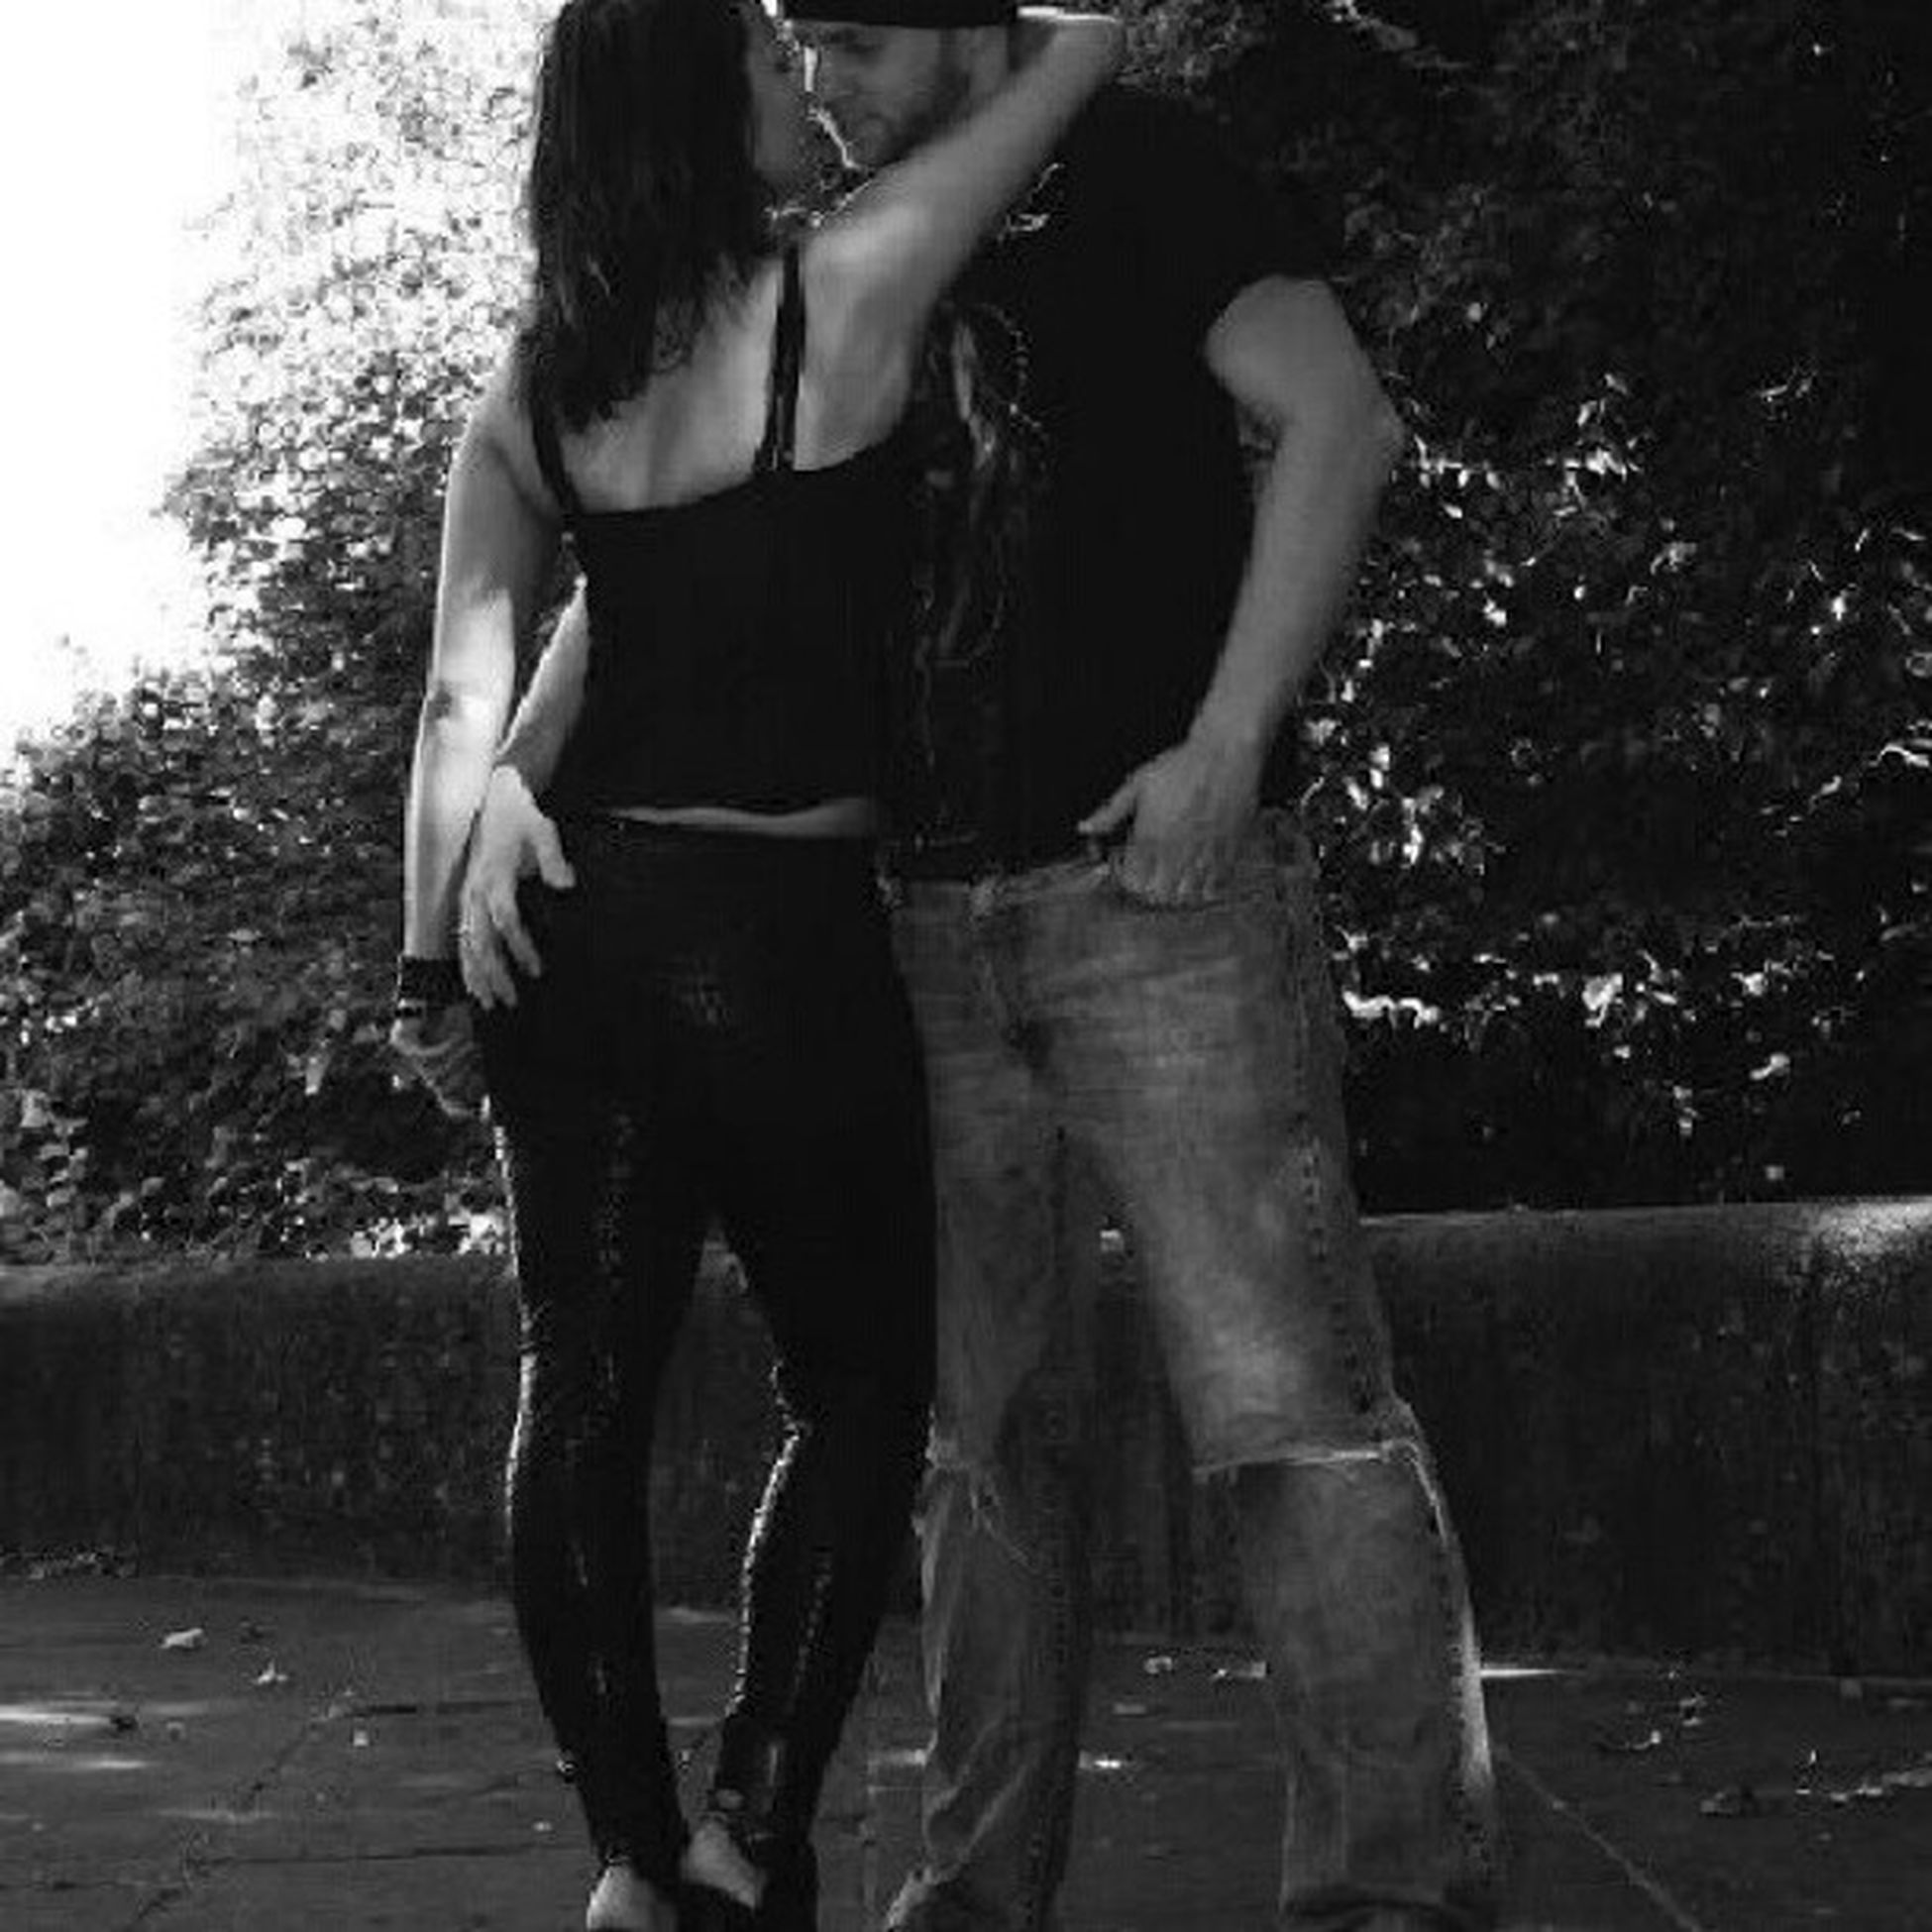 Me and my Wife Instahottie Instahotties Couple blackandwhite love